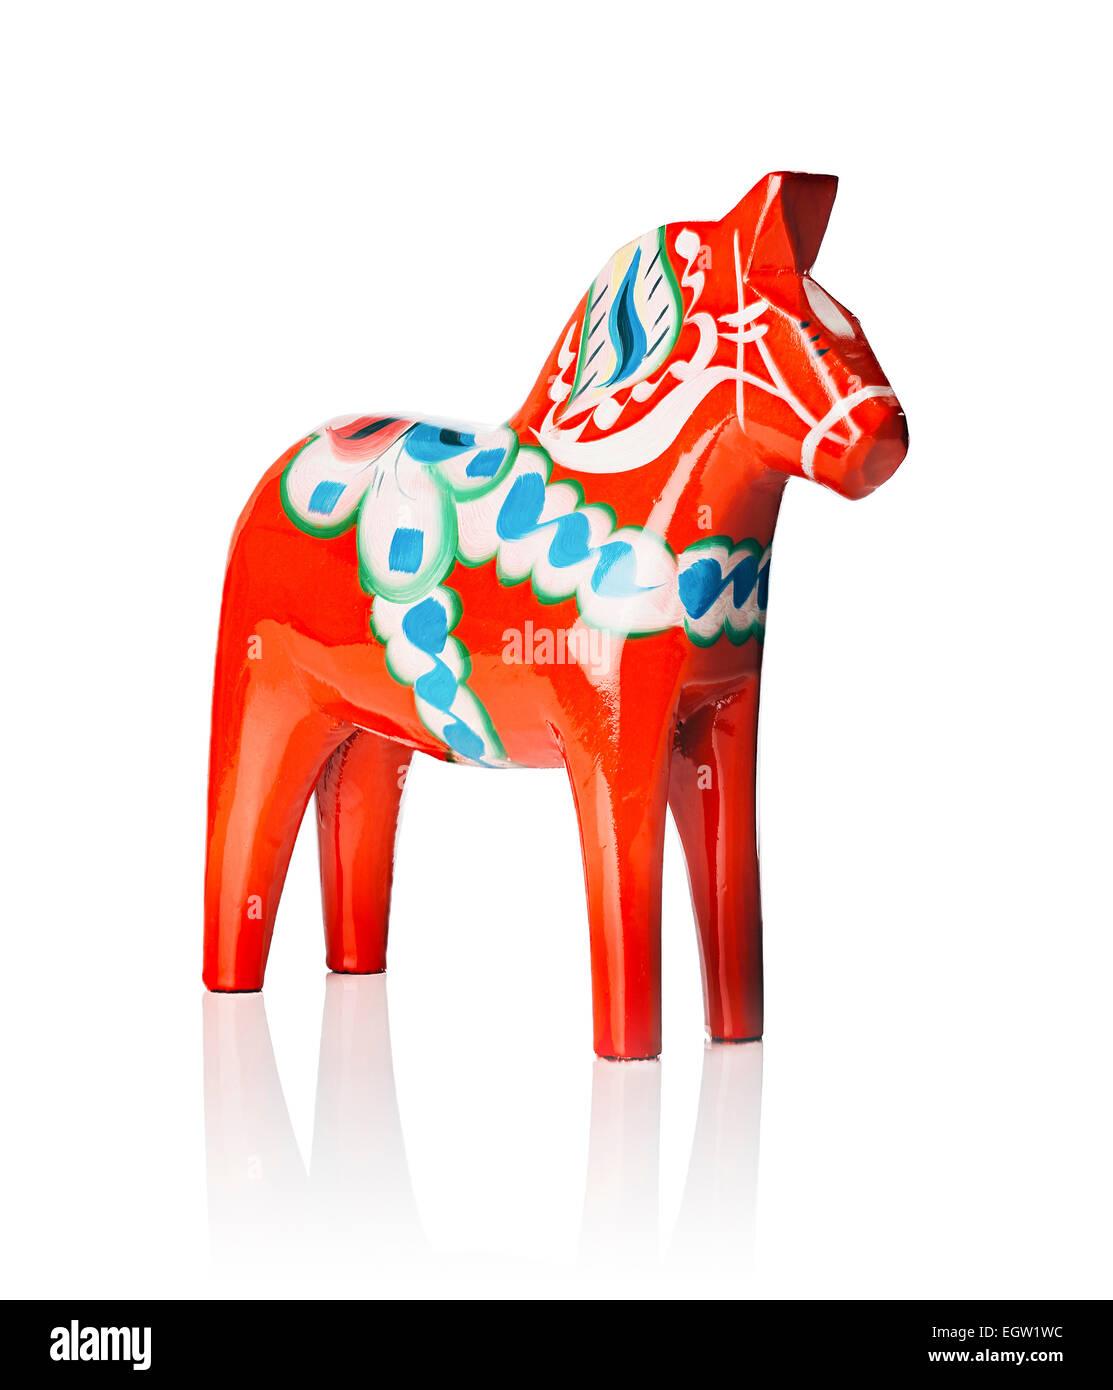 A Traditional Dalecarlian horse or Dala horse (Swedish: Dalahast) It has become a symbol of Dalarna as well as Sweden - Stock Image